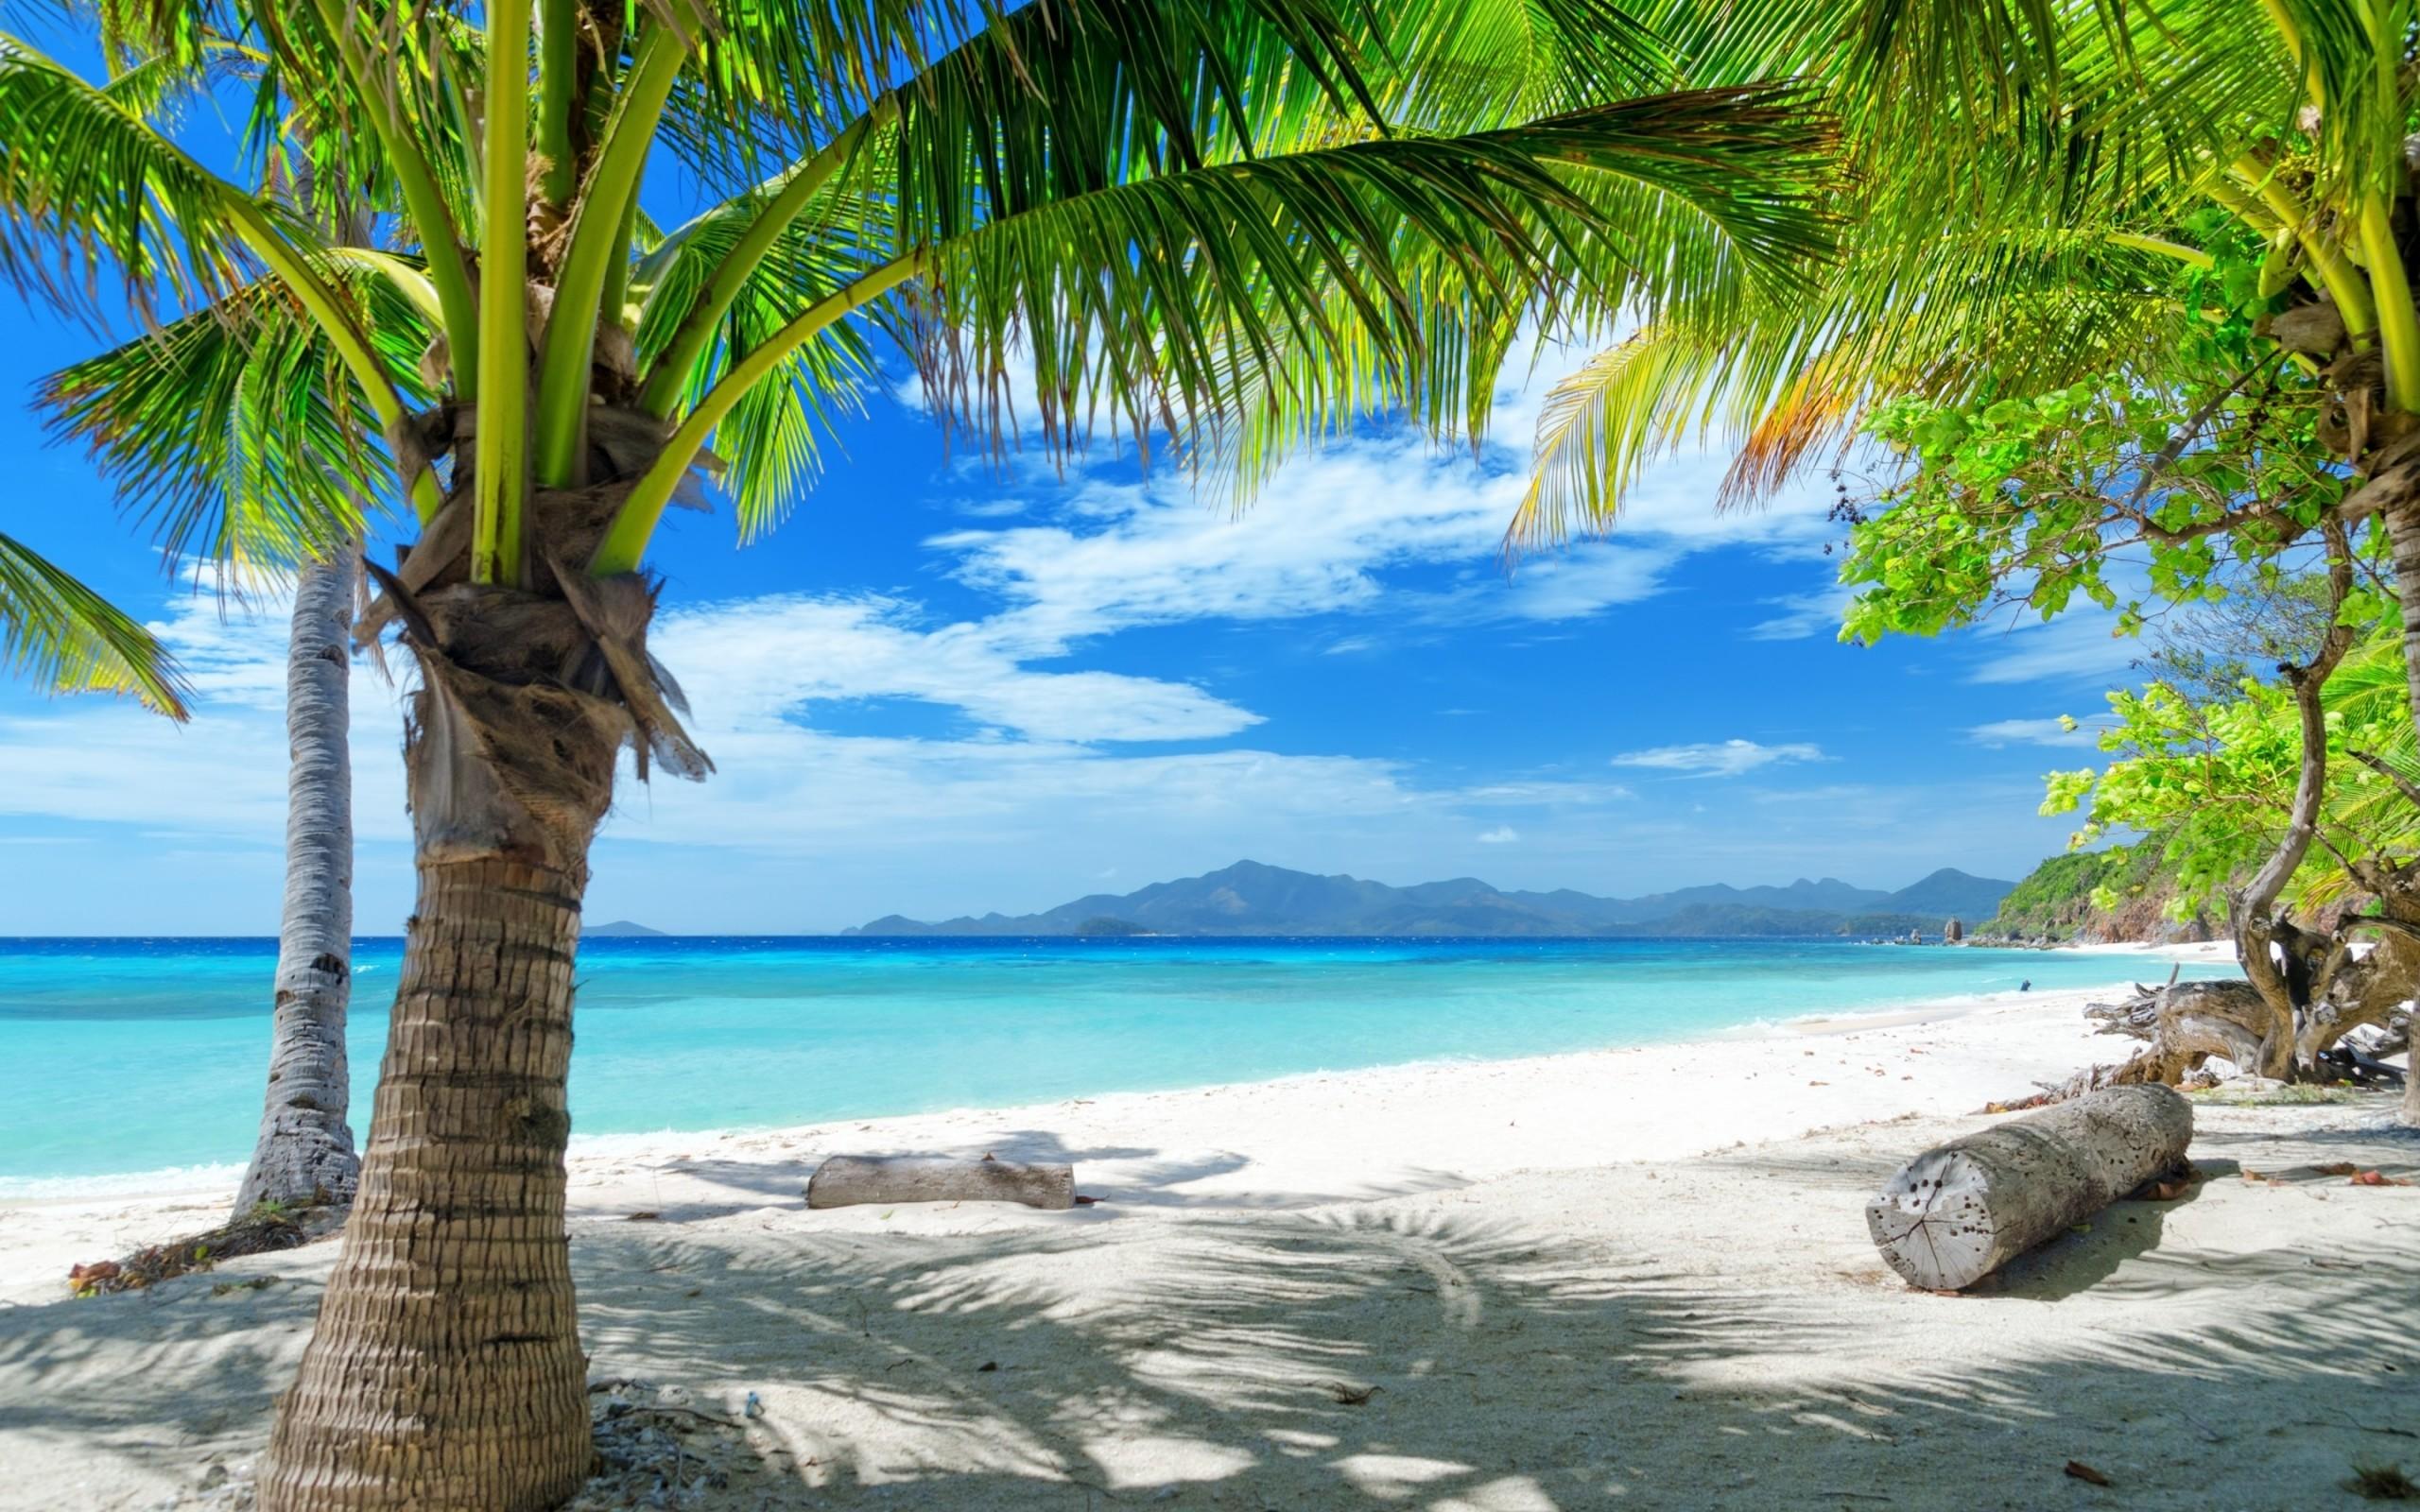 Tempting ocean beach with palm trees HD Desktop Wallpaper   HD Desktop .